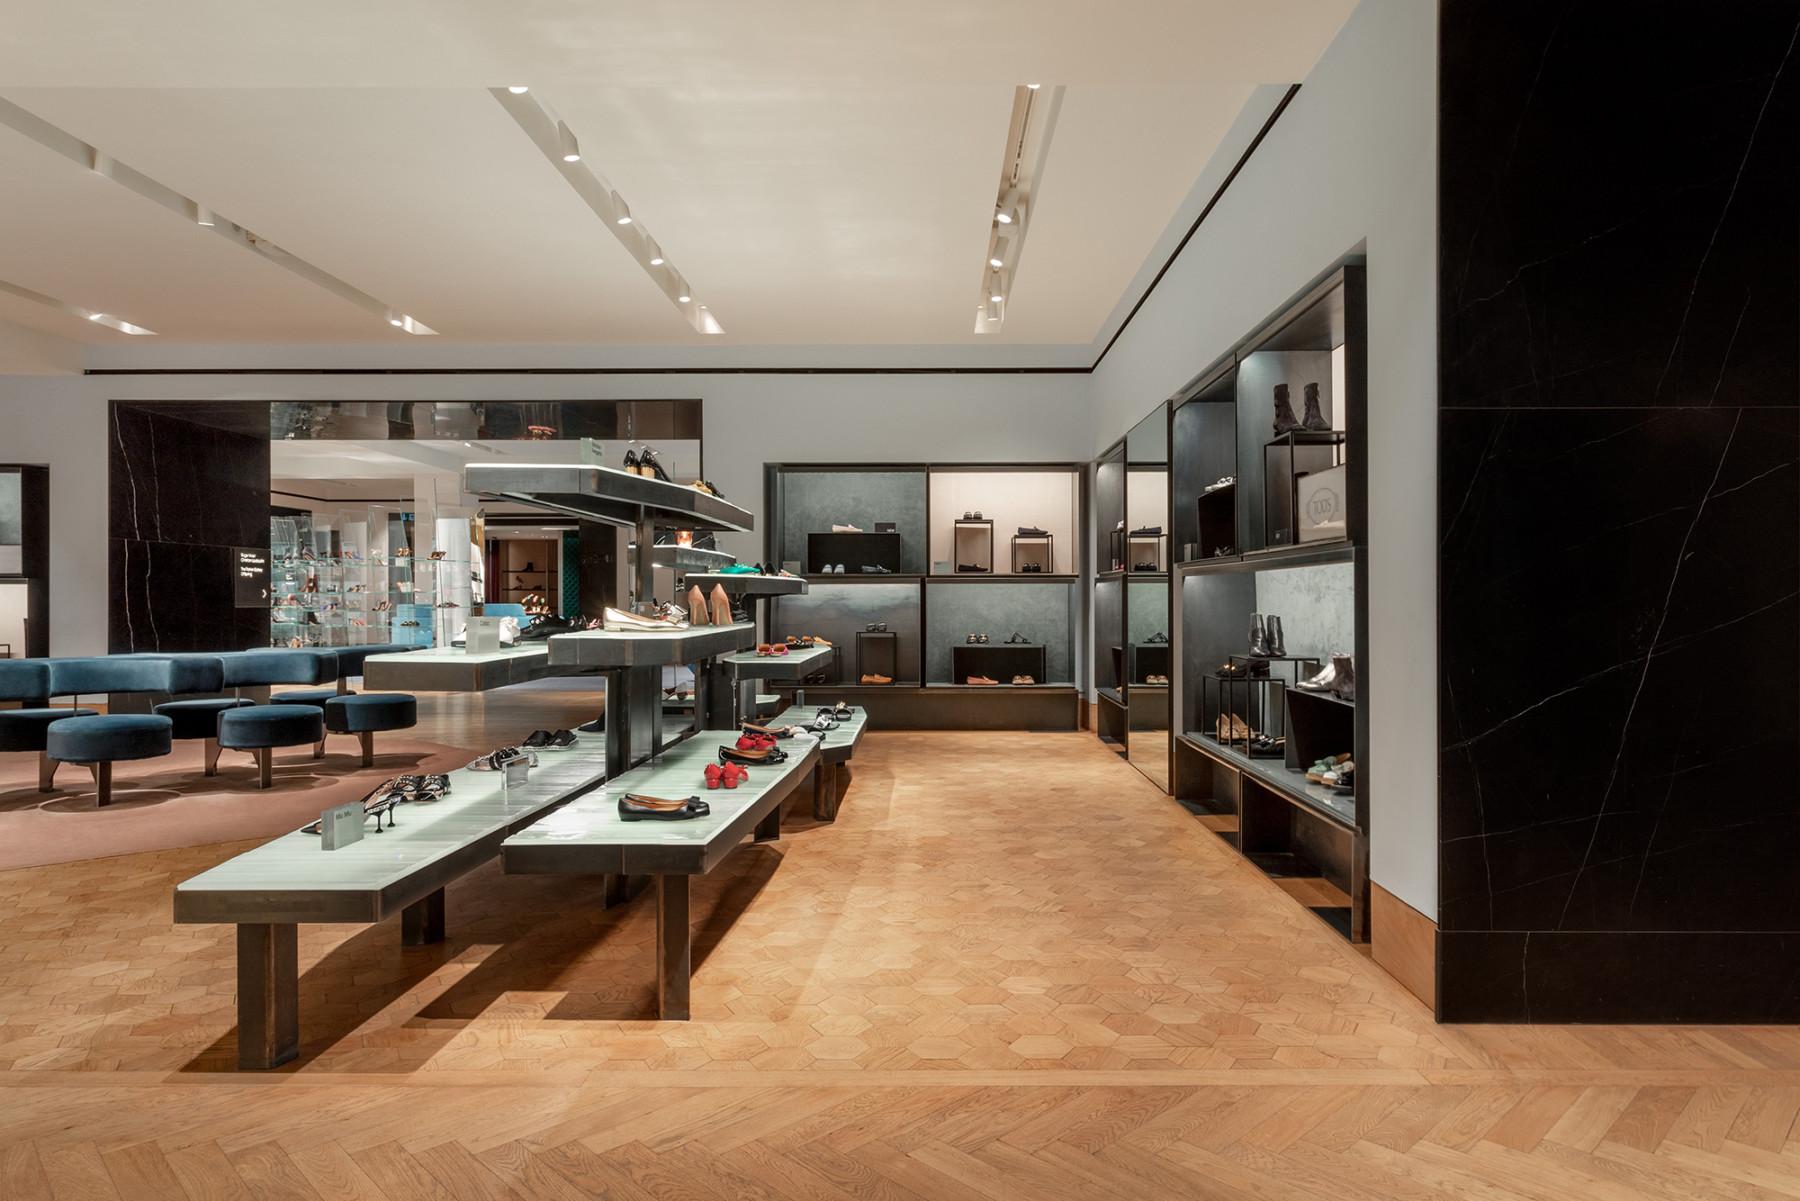 jamie-fobert-architects-selfridges-shoe-galleries-luxury-retail-concept-gallery-design-olivier-hess-photos-(6)